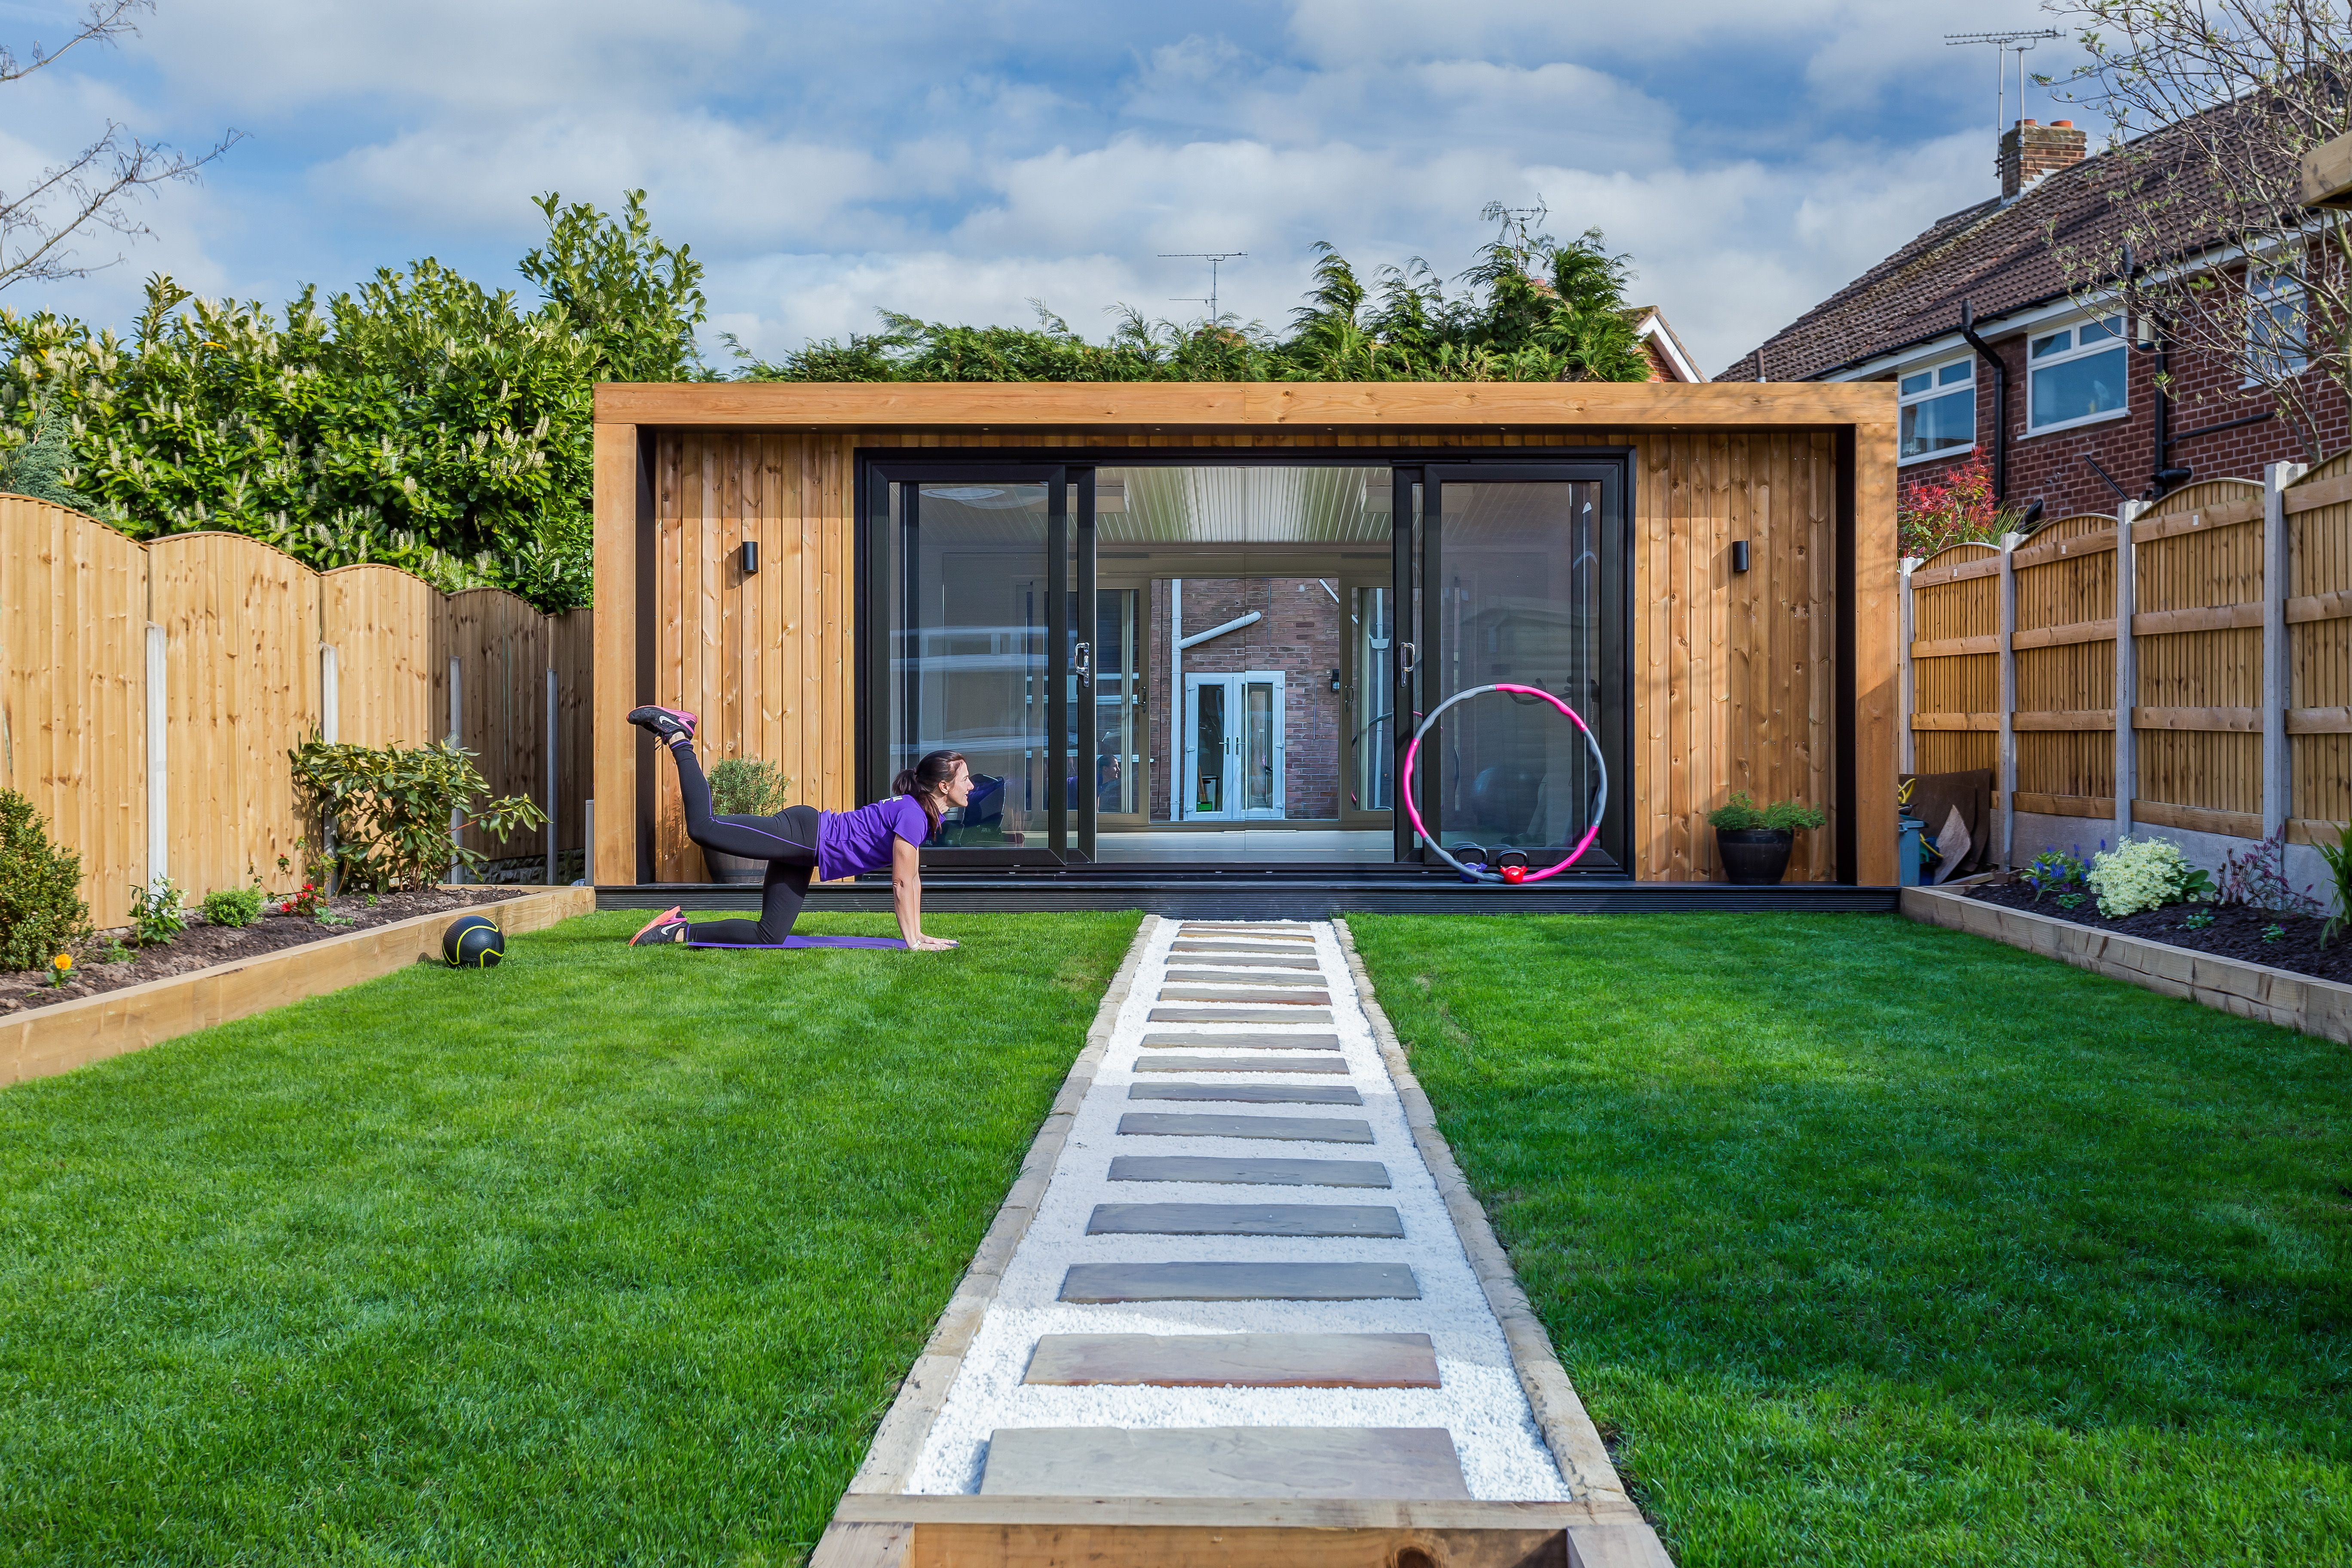 The UK's original garden room company Green Retreats